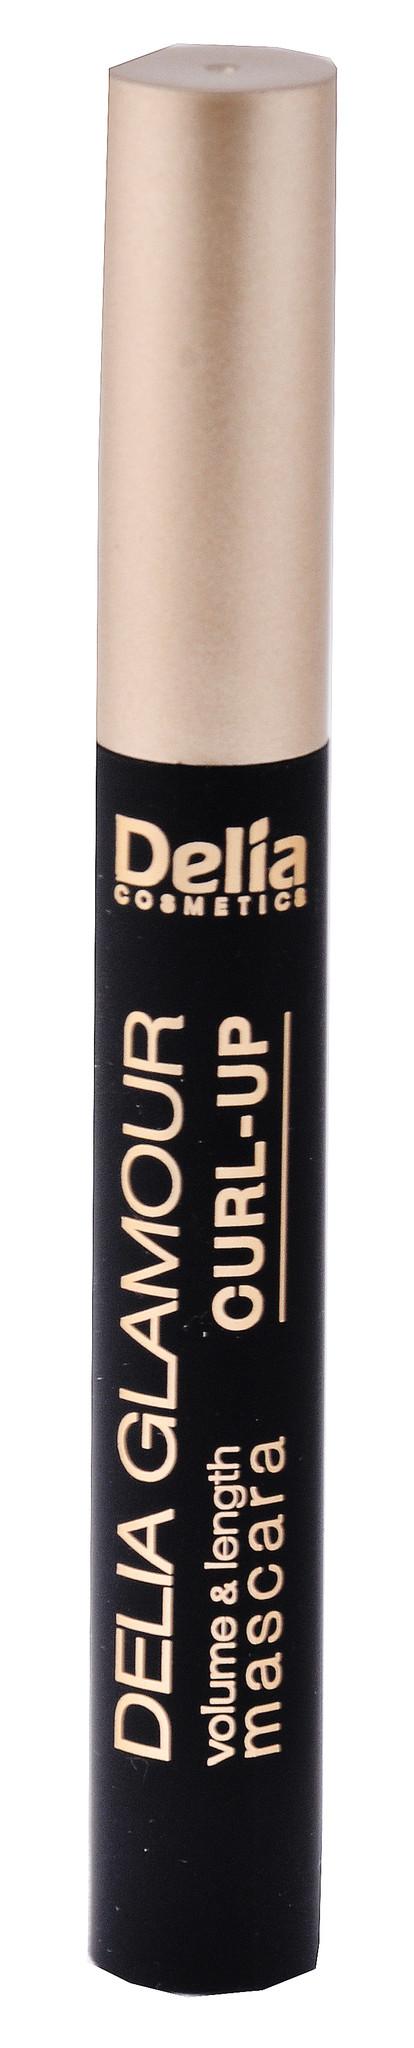 "Тушь для ресниц ""Delia"" New Look Mascara Volume (12ml)"